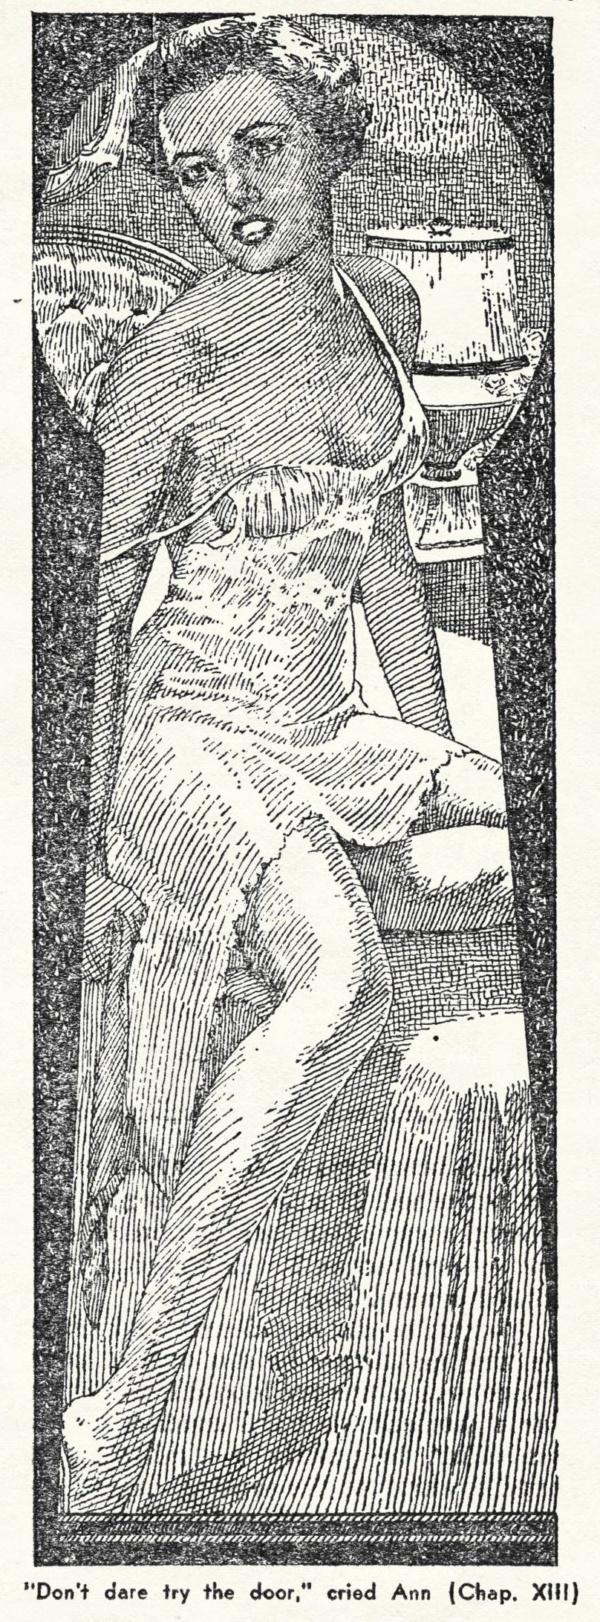 Startling Stories v20 n03 [1950-01] 0015